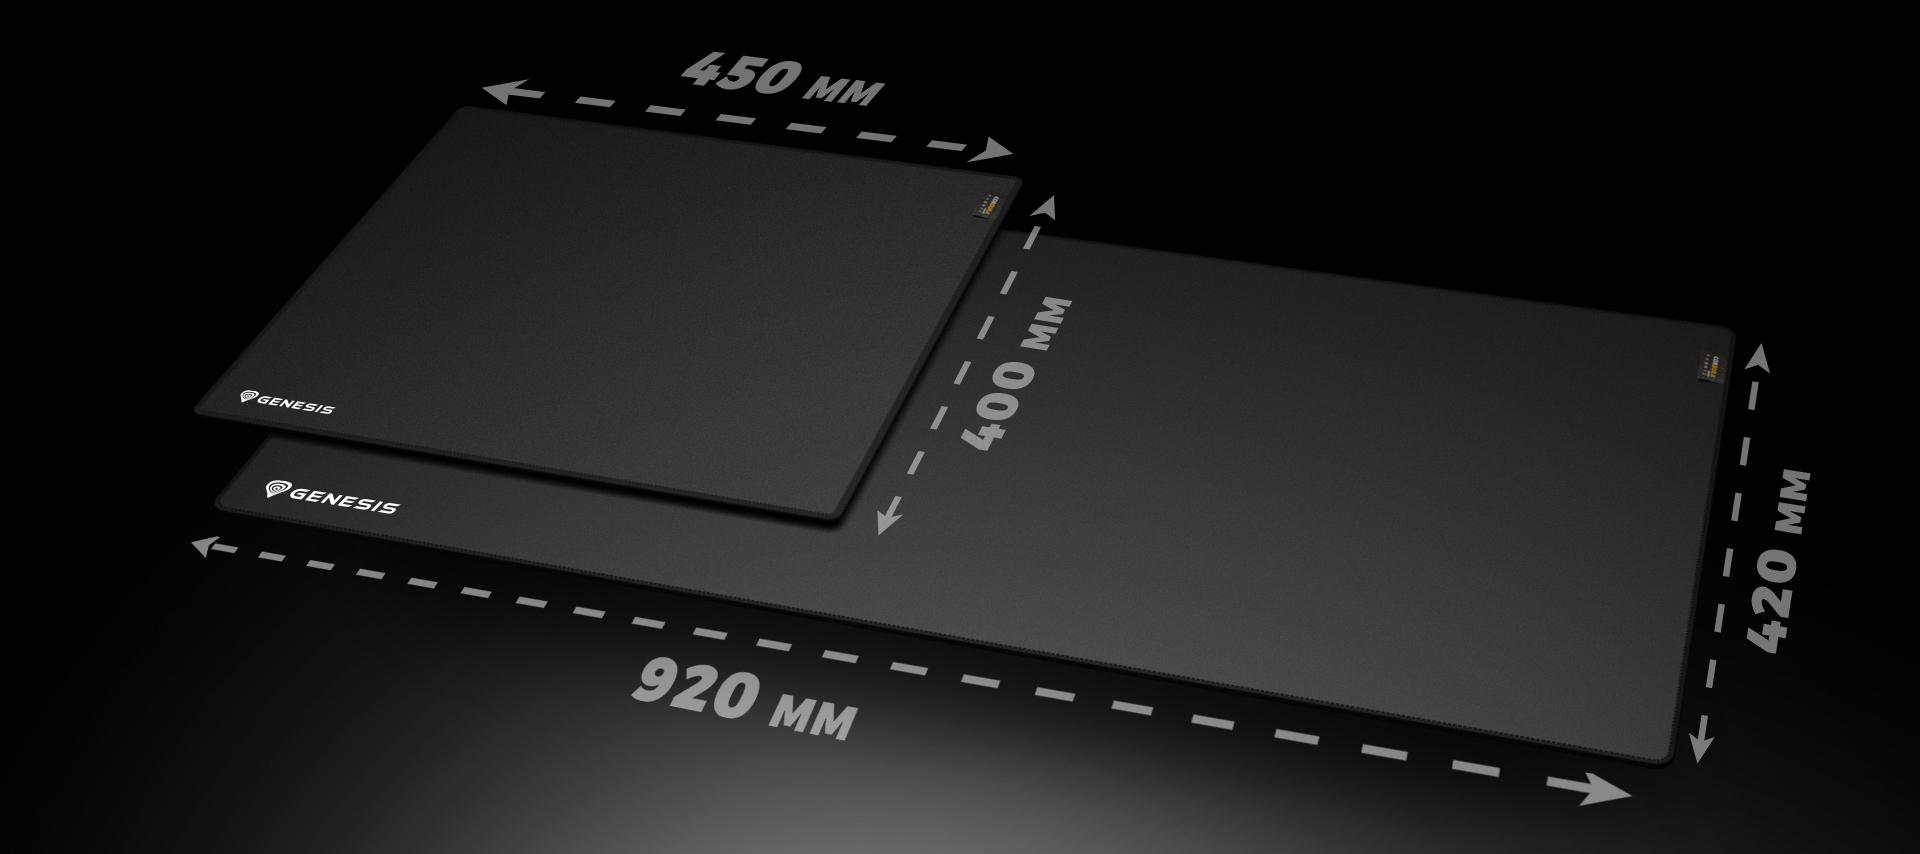 mouse pad genesis carbon 700 700 cordura maxi 900x420 mm 8